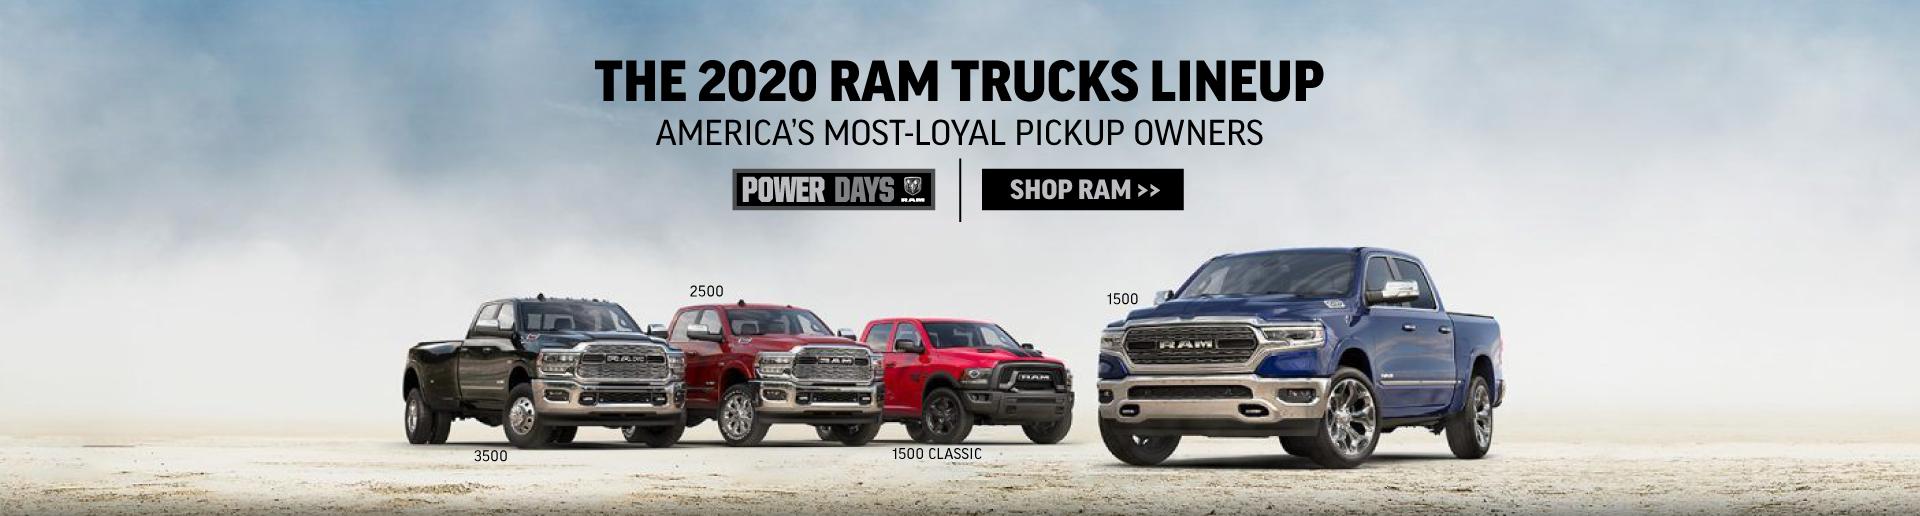 2020 Ram Generic